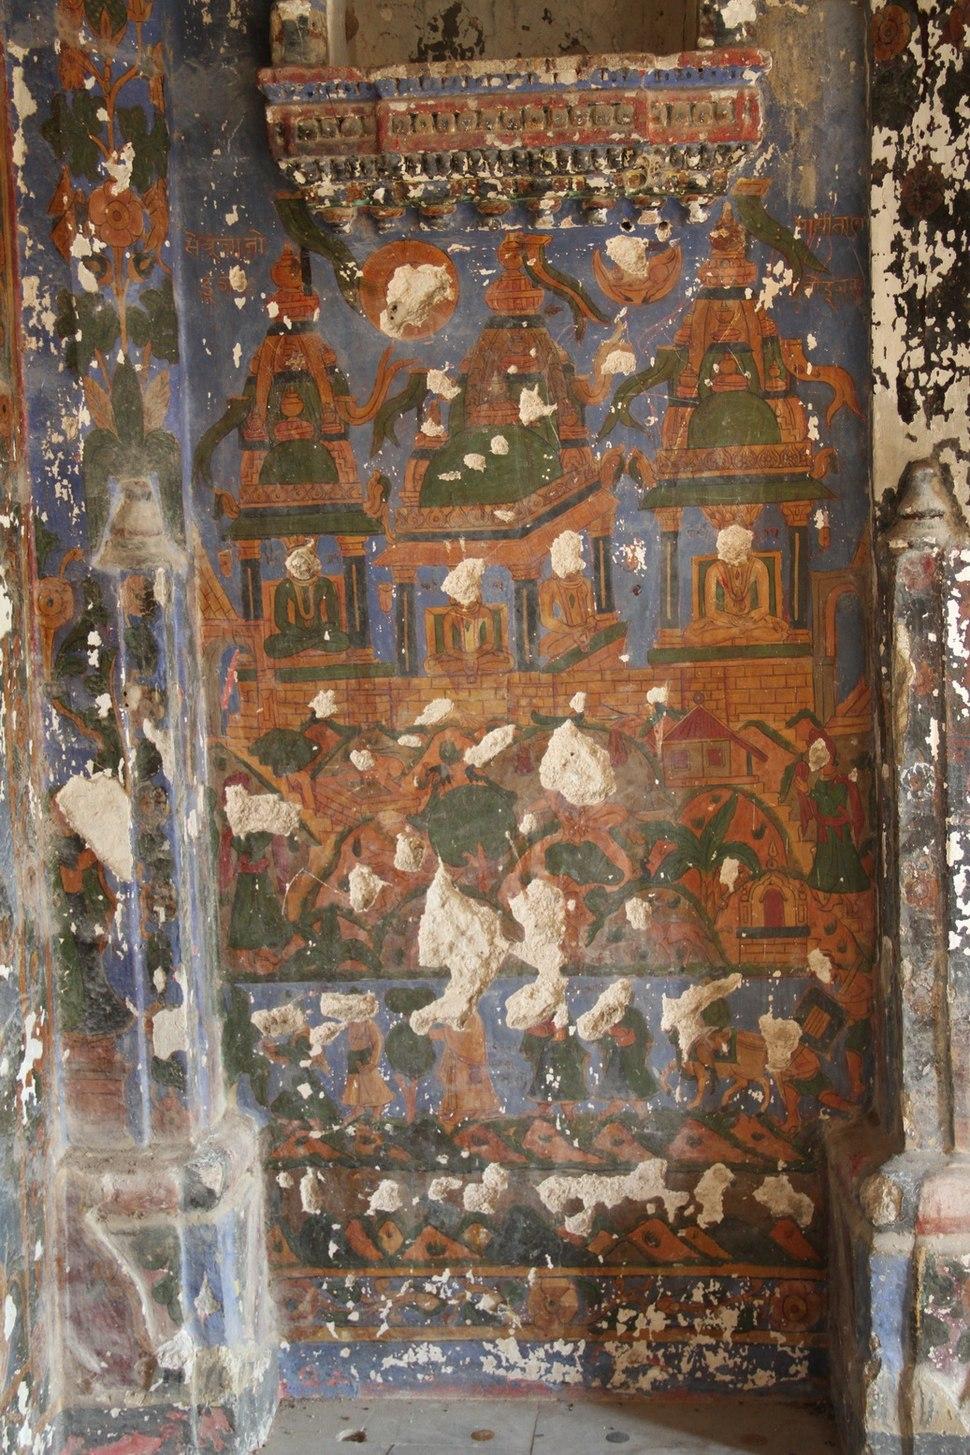 Jain Temple Nagarparkar by smn121-4